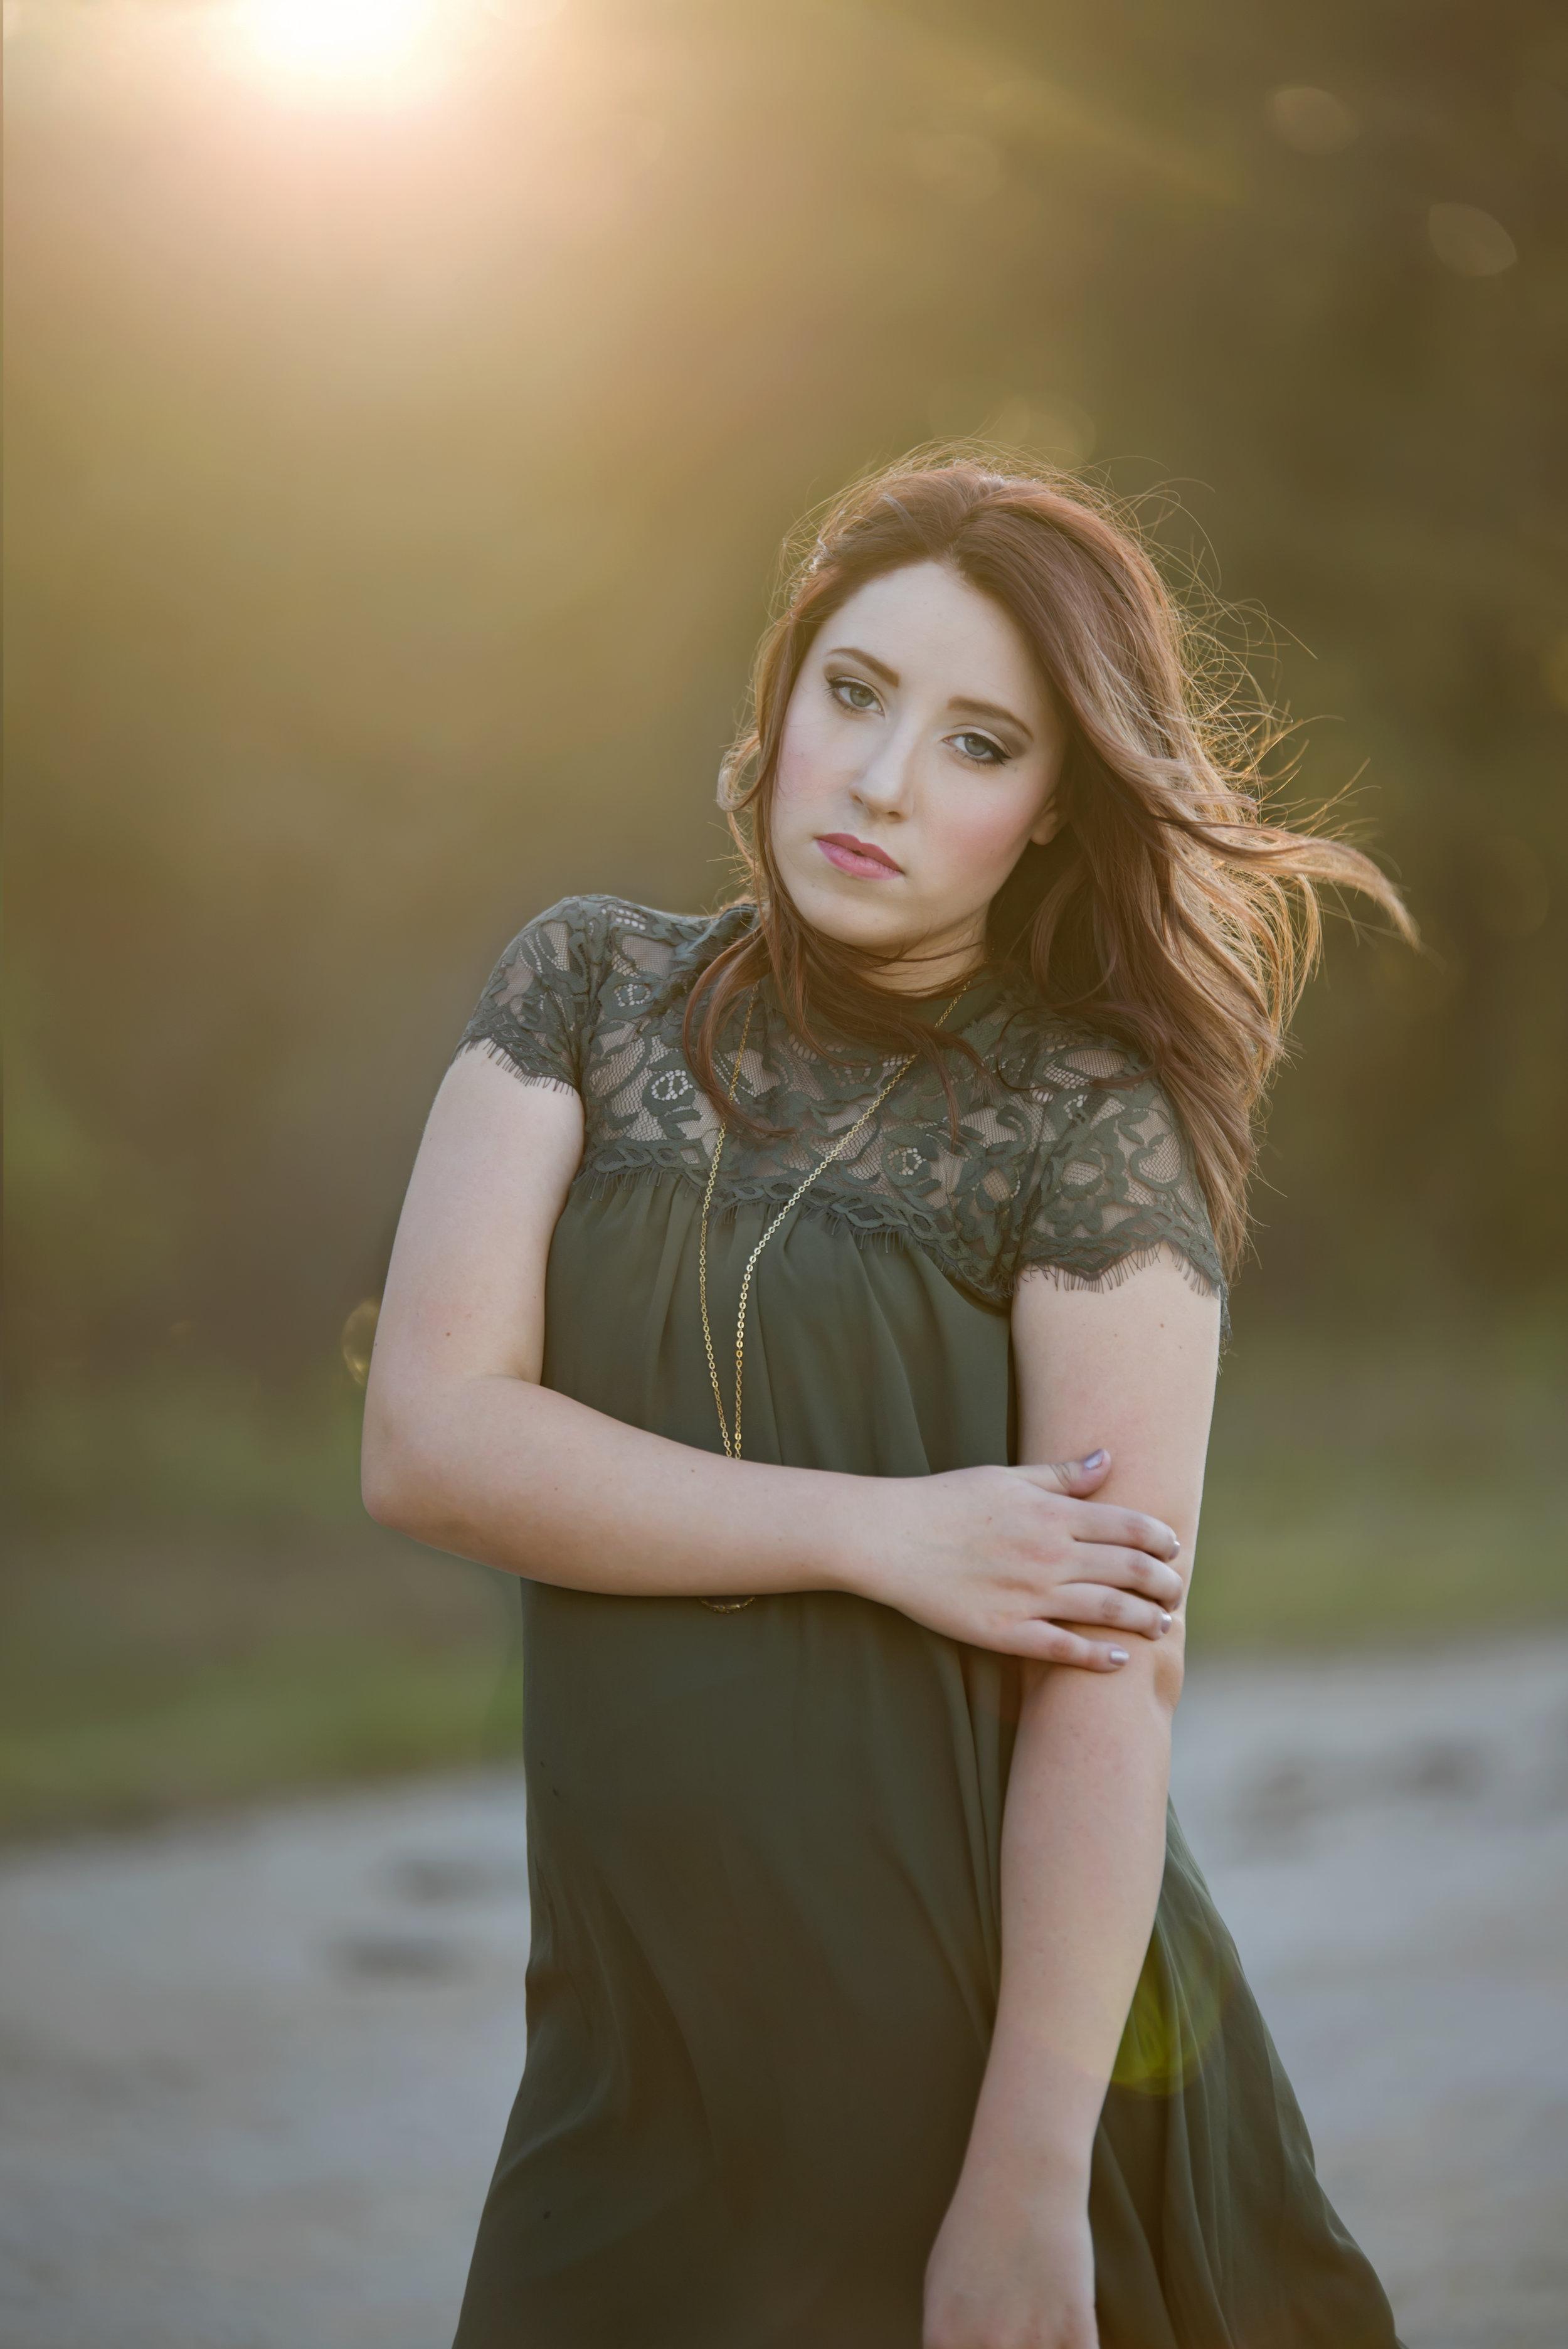 Reina-LeGrand-Photography-Photographer-Senior-azle-beauty-DFW-Dallas-Fort-Worth-Denton-Southlake-Colleyville-Grapevine-Roanoke-Keller-Westlake-Portrait-Portraiture-Photo-Session-k-argyle.jpg